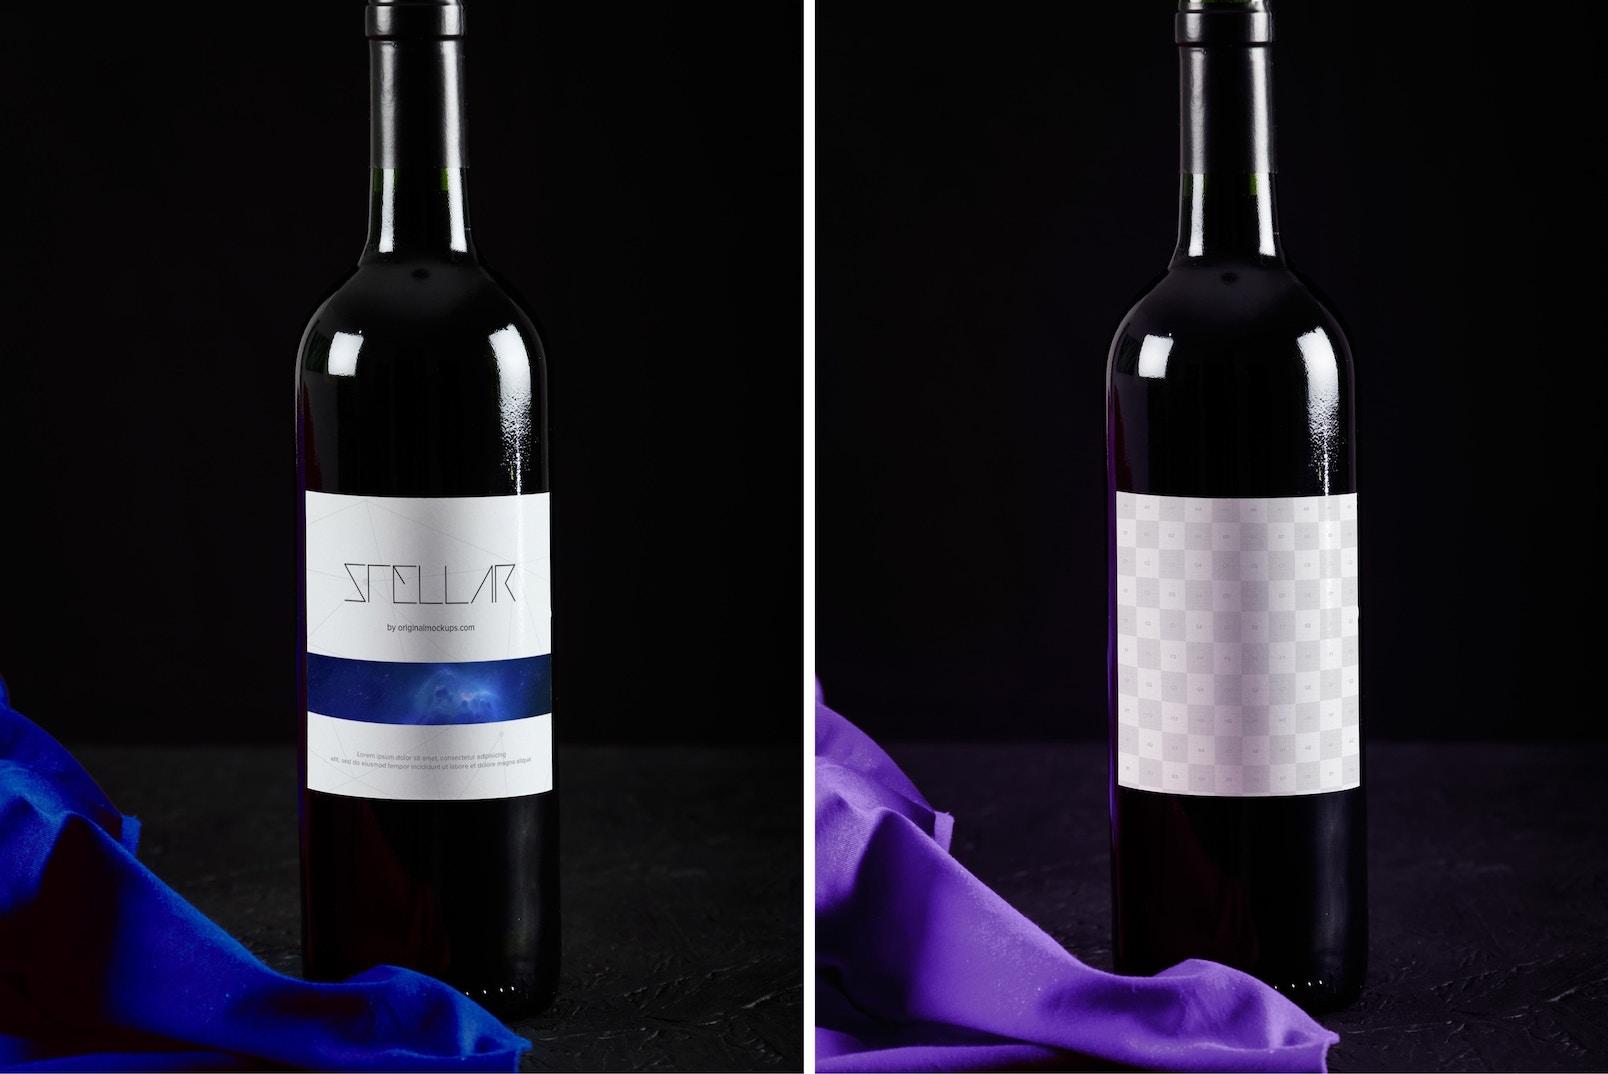 Maqueta de Botella de Vino 9